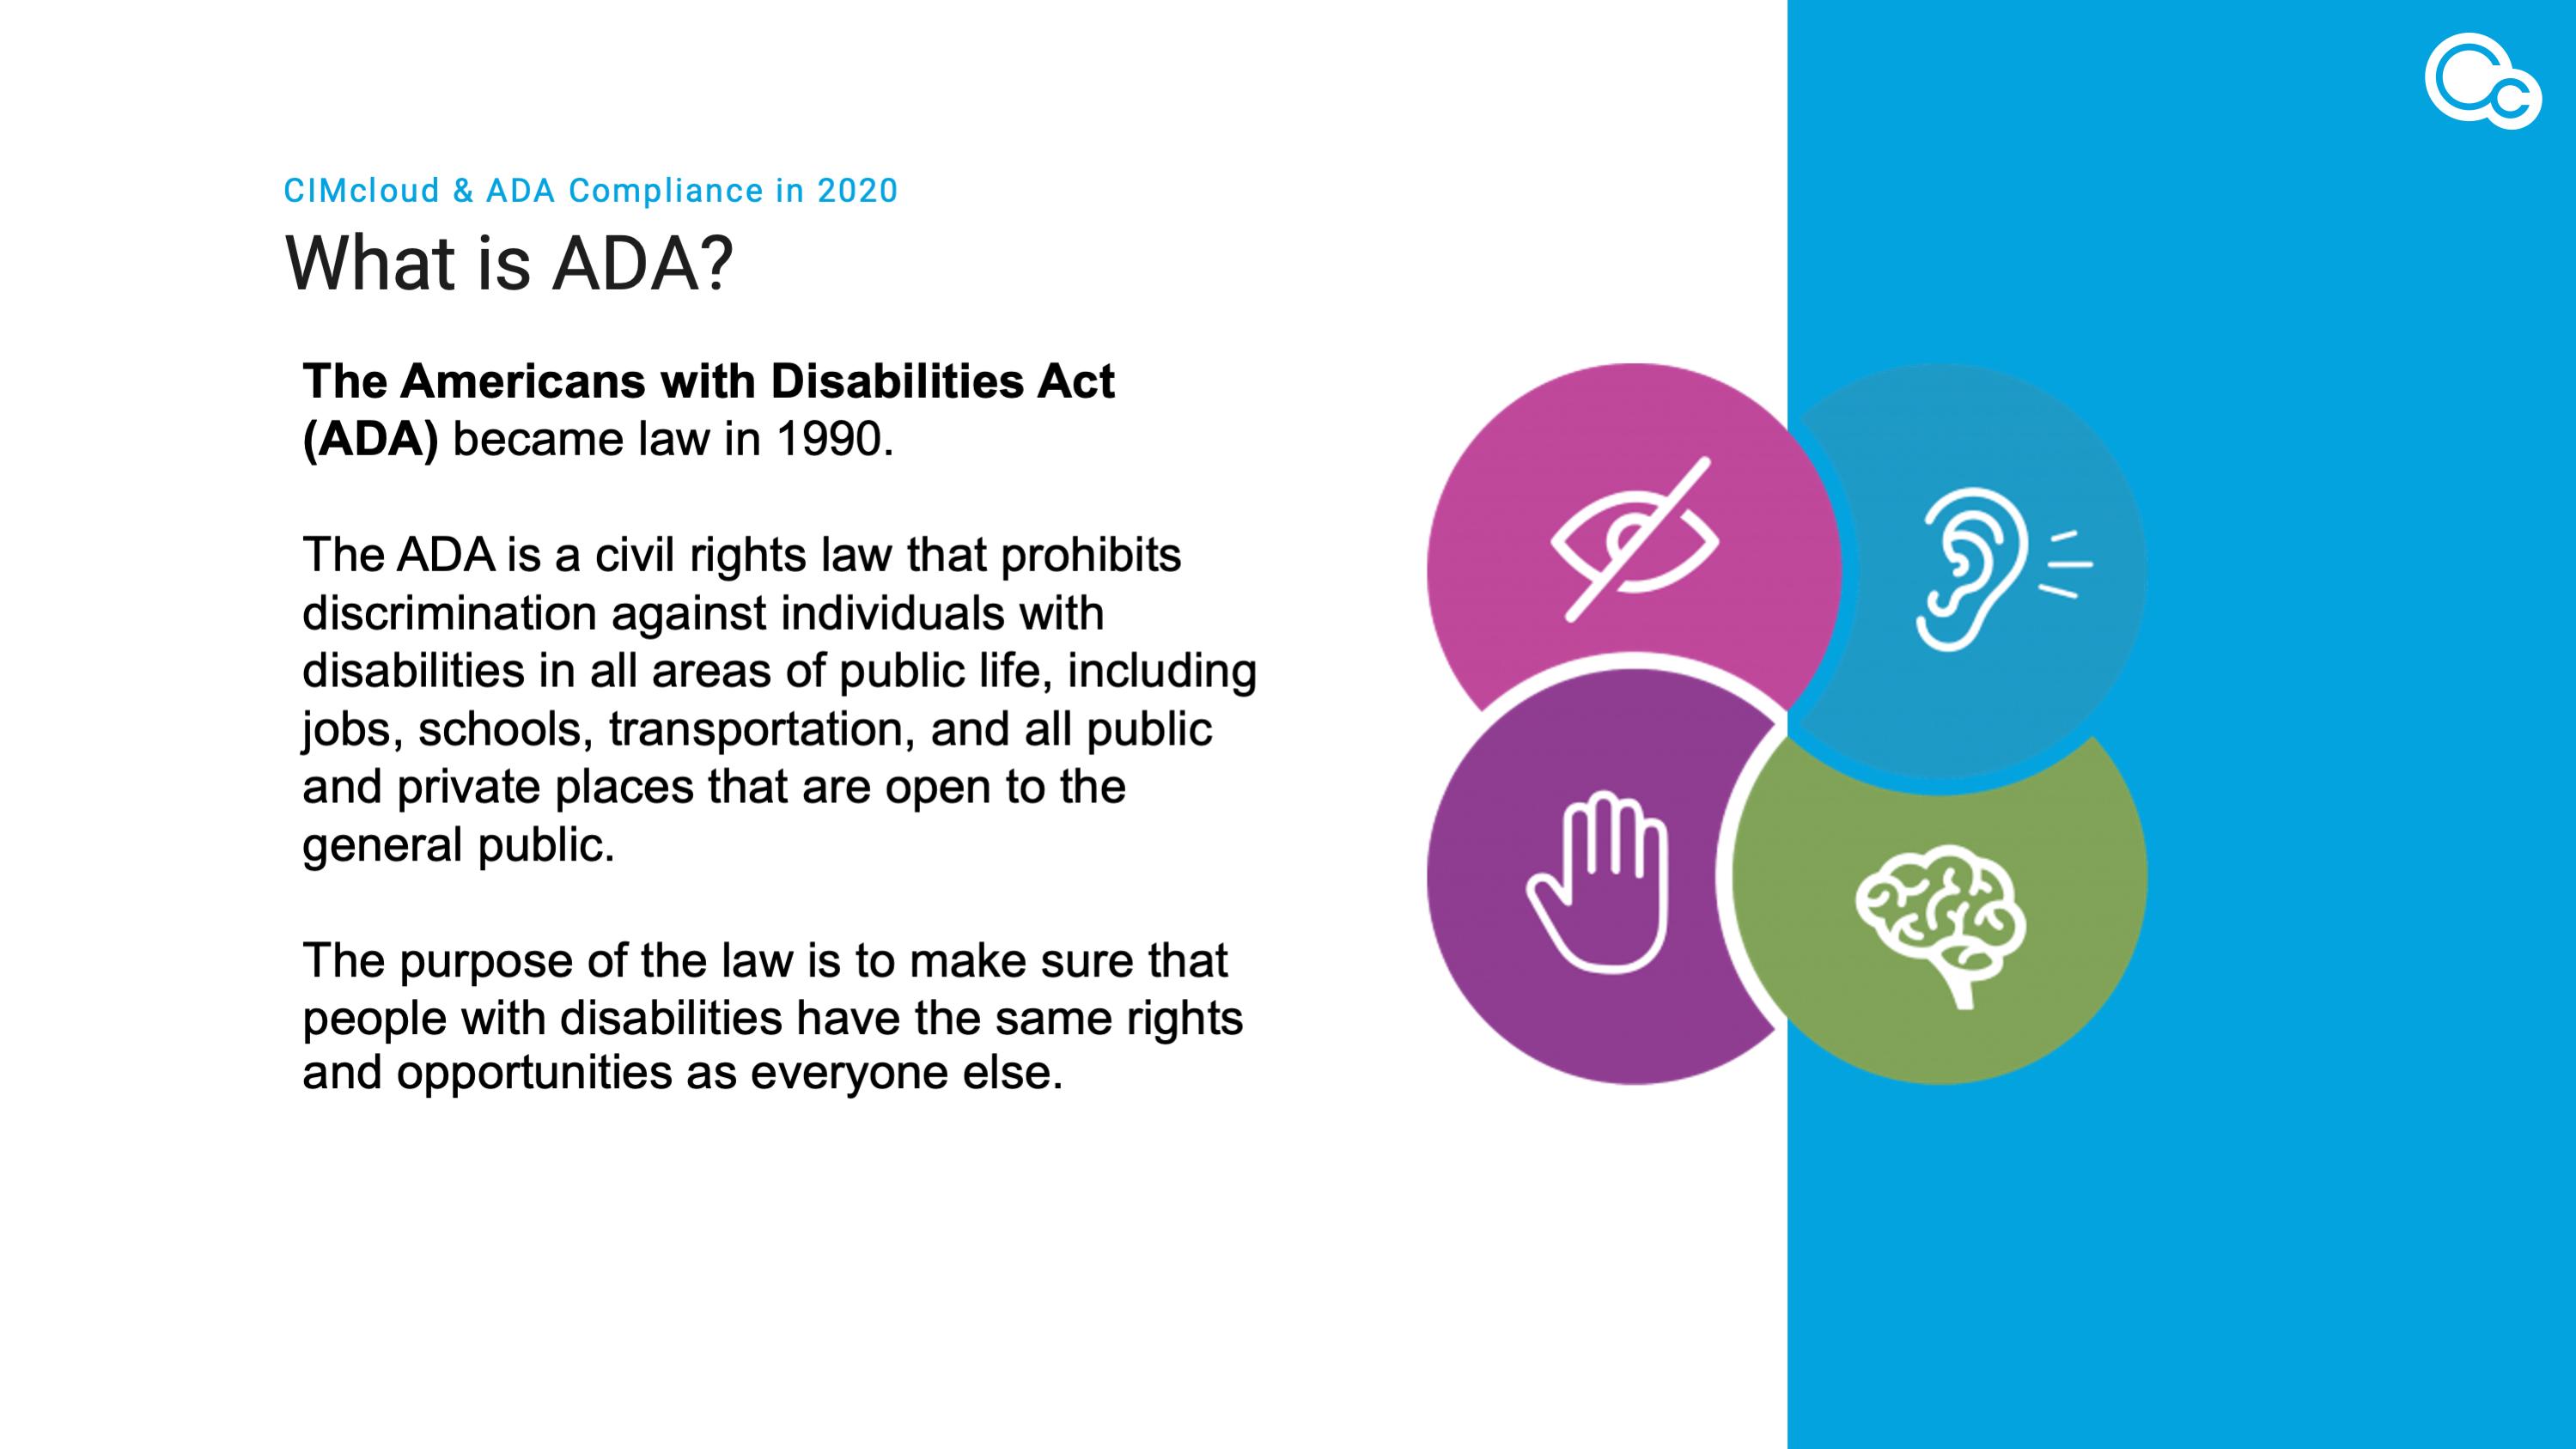 CIMcloud & ADA Compliance in 2020 image